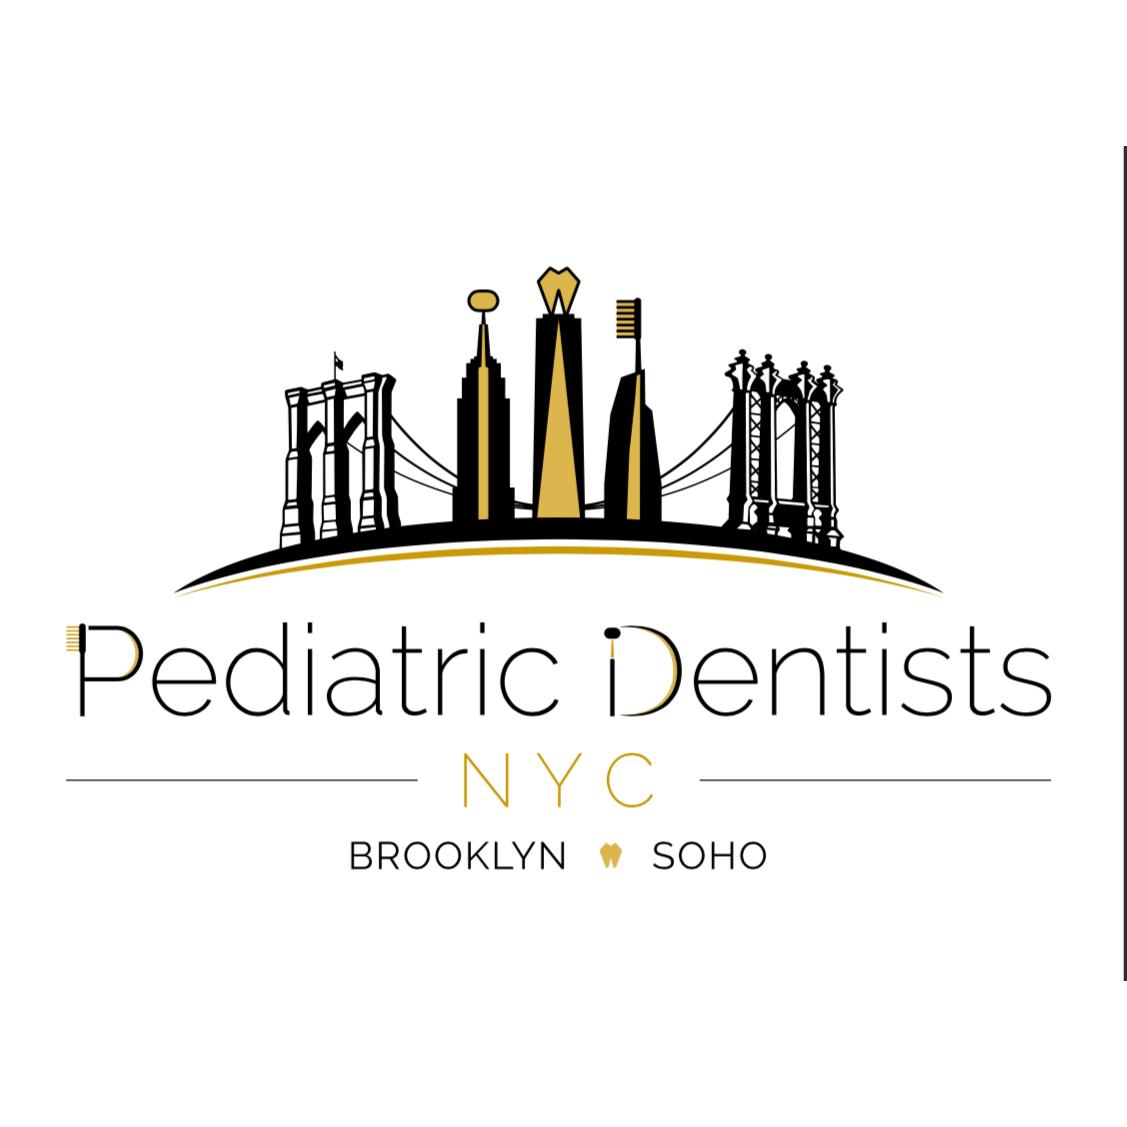 Pediatric Dentists NYC, PC